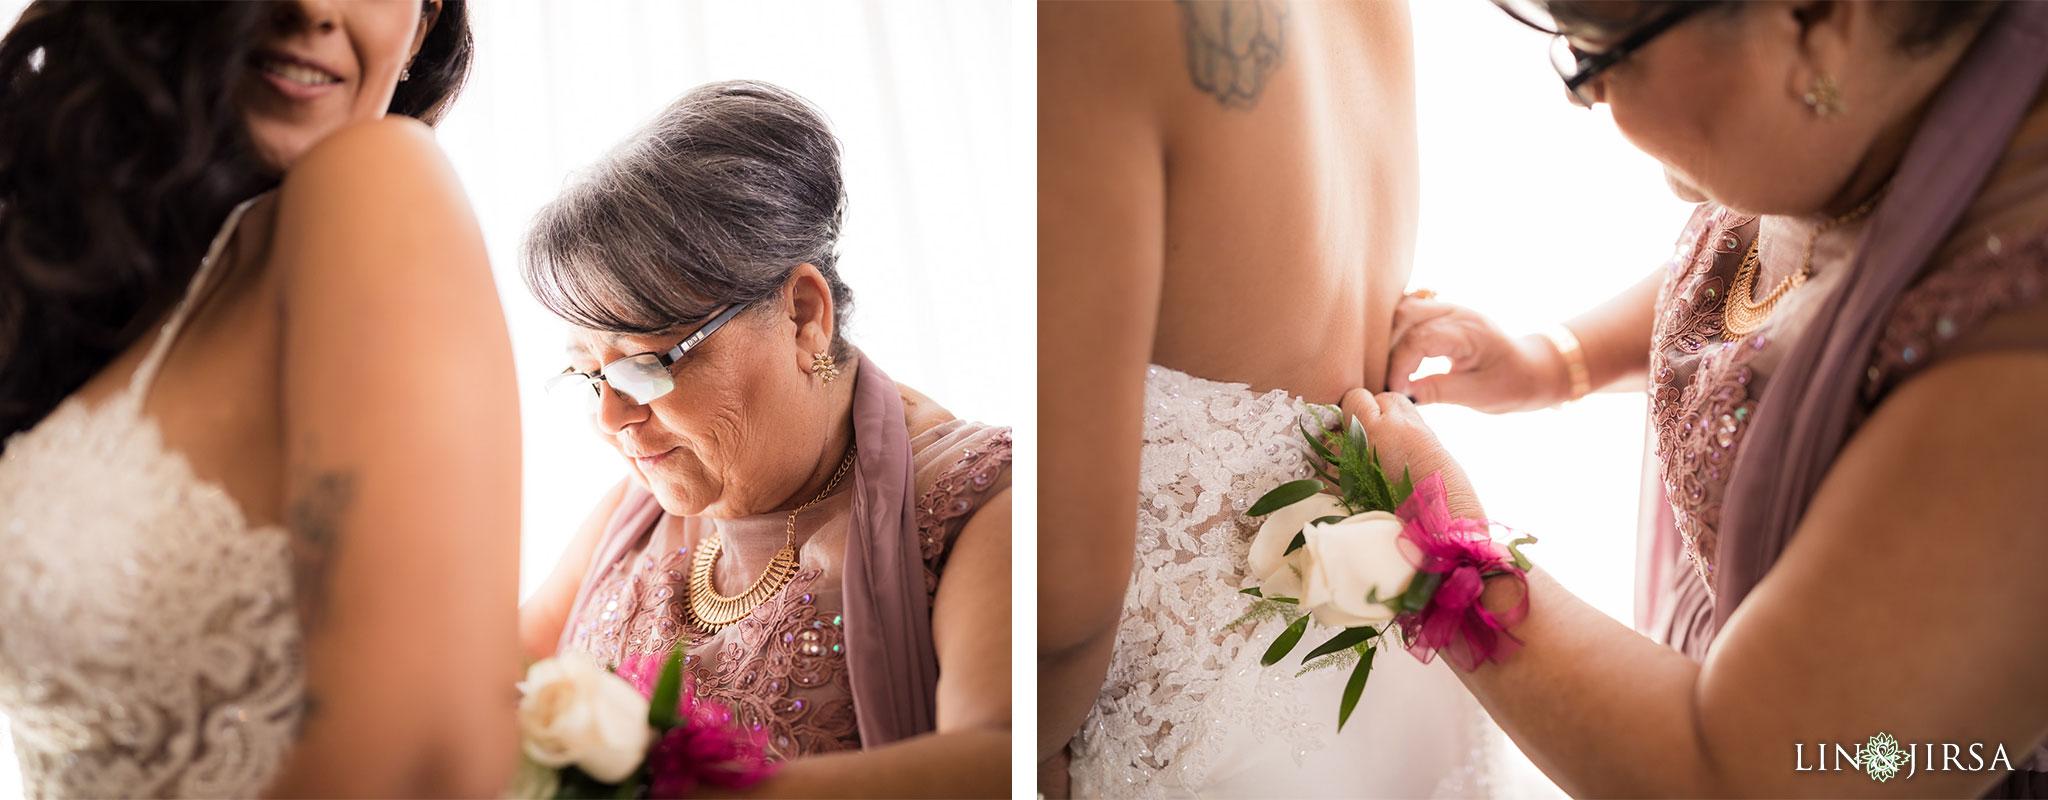 03 orange county bride wedding photography